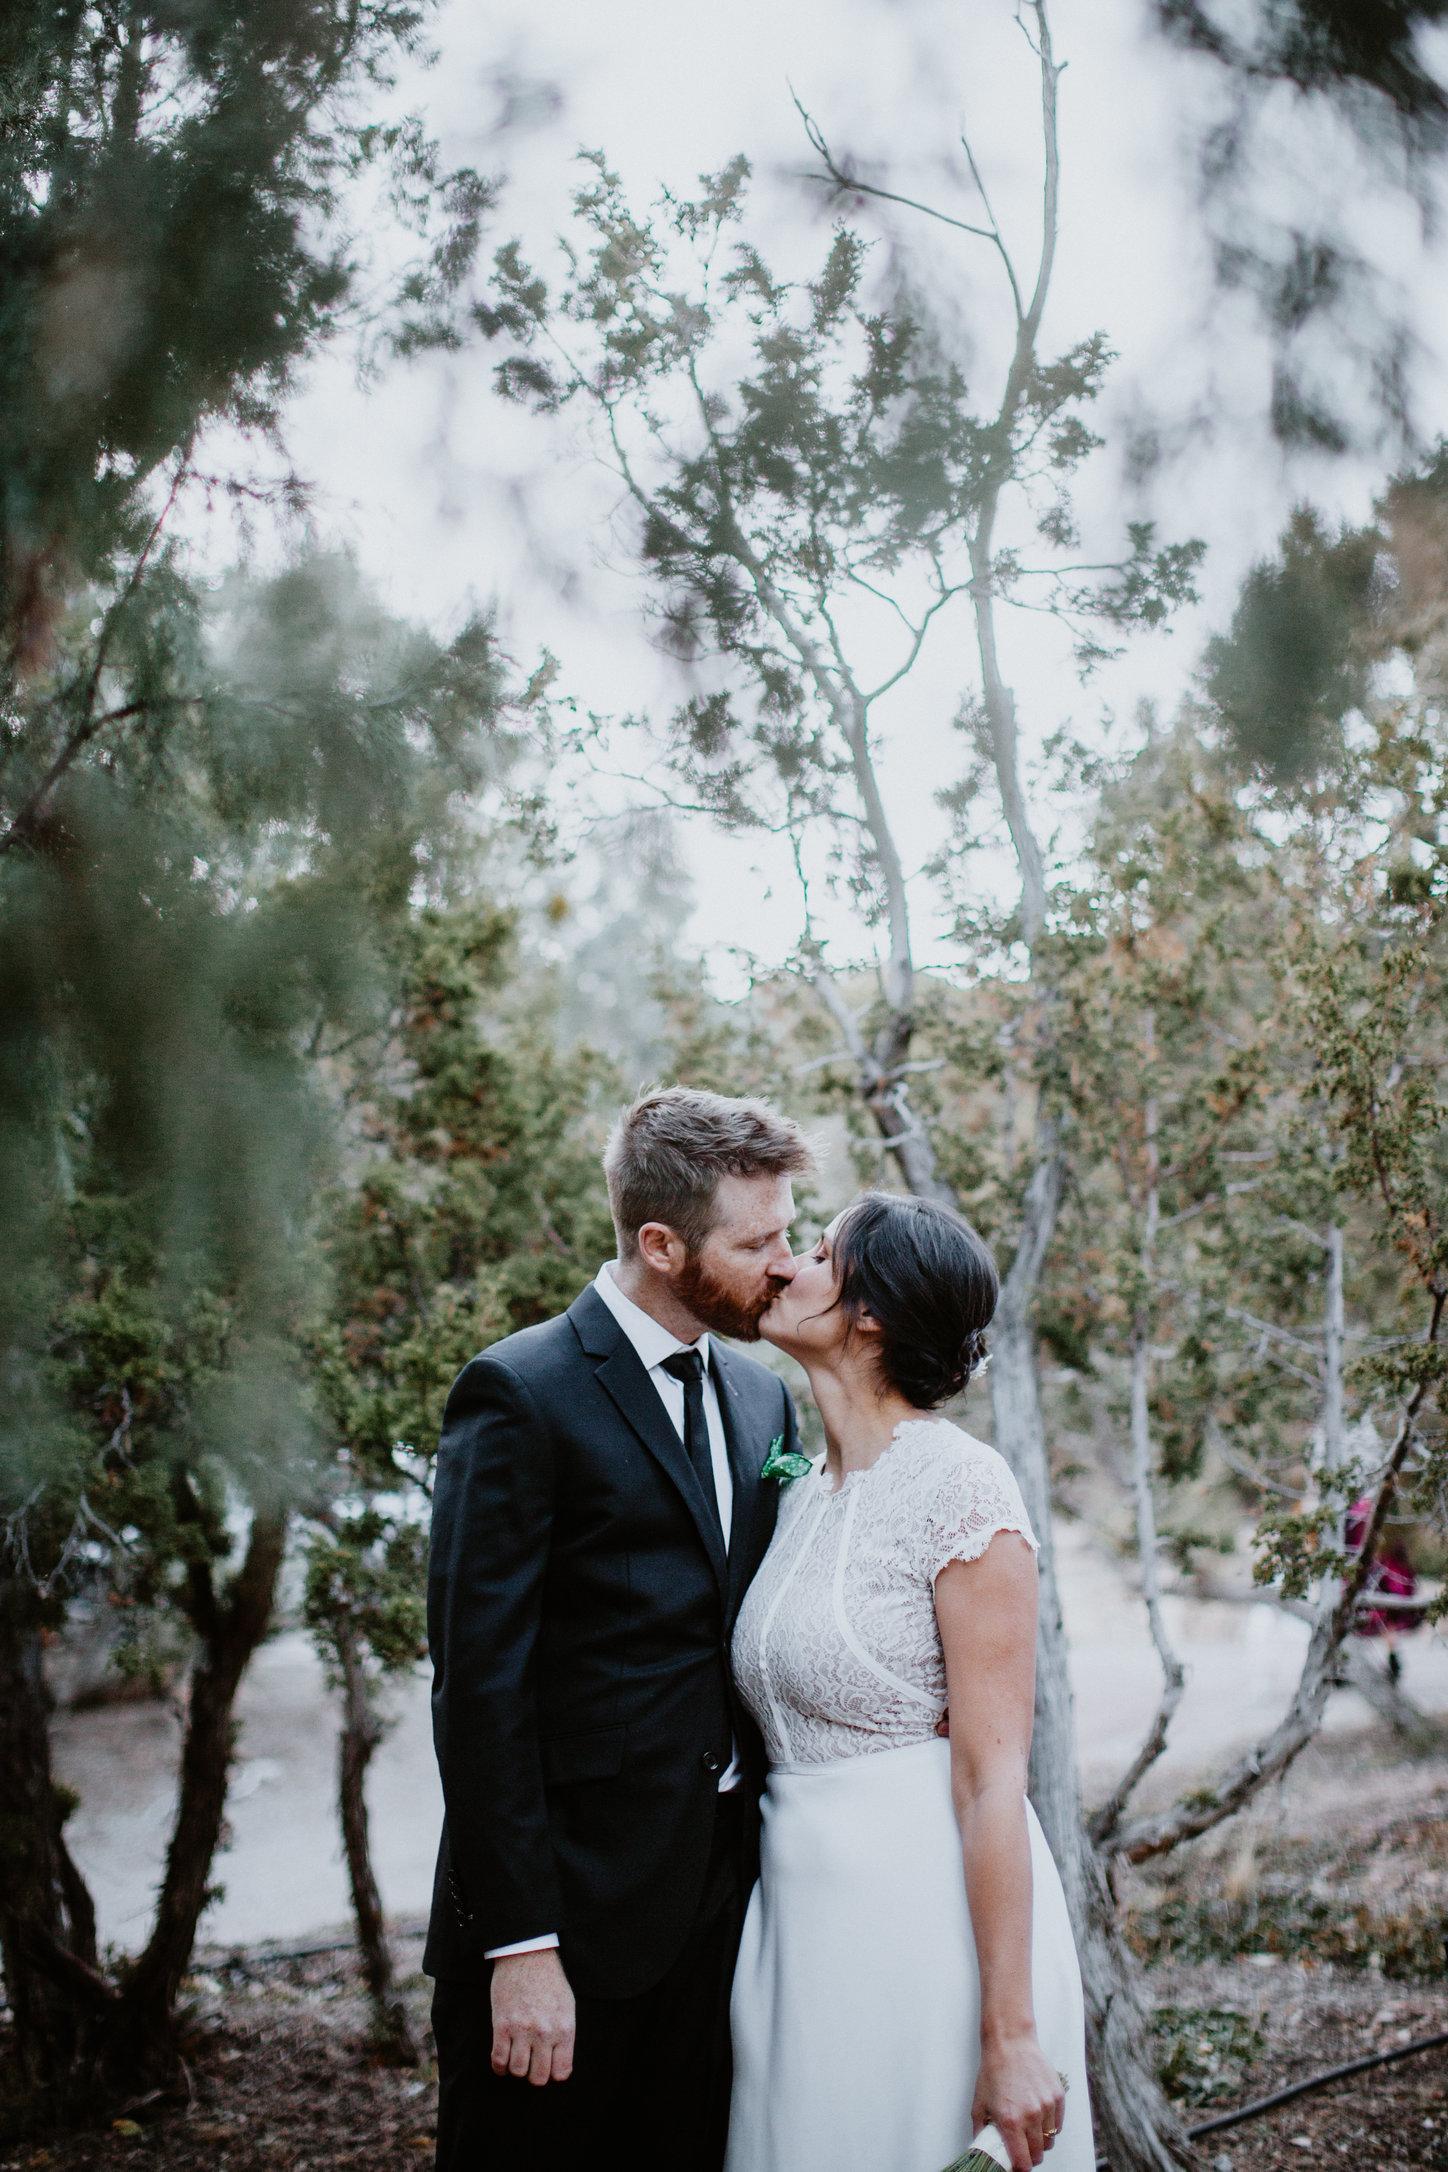 HandM-wedding-156.jpg